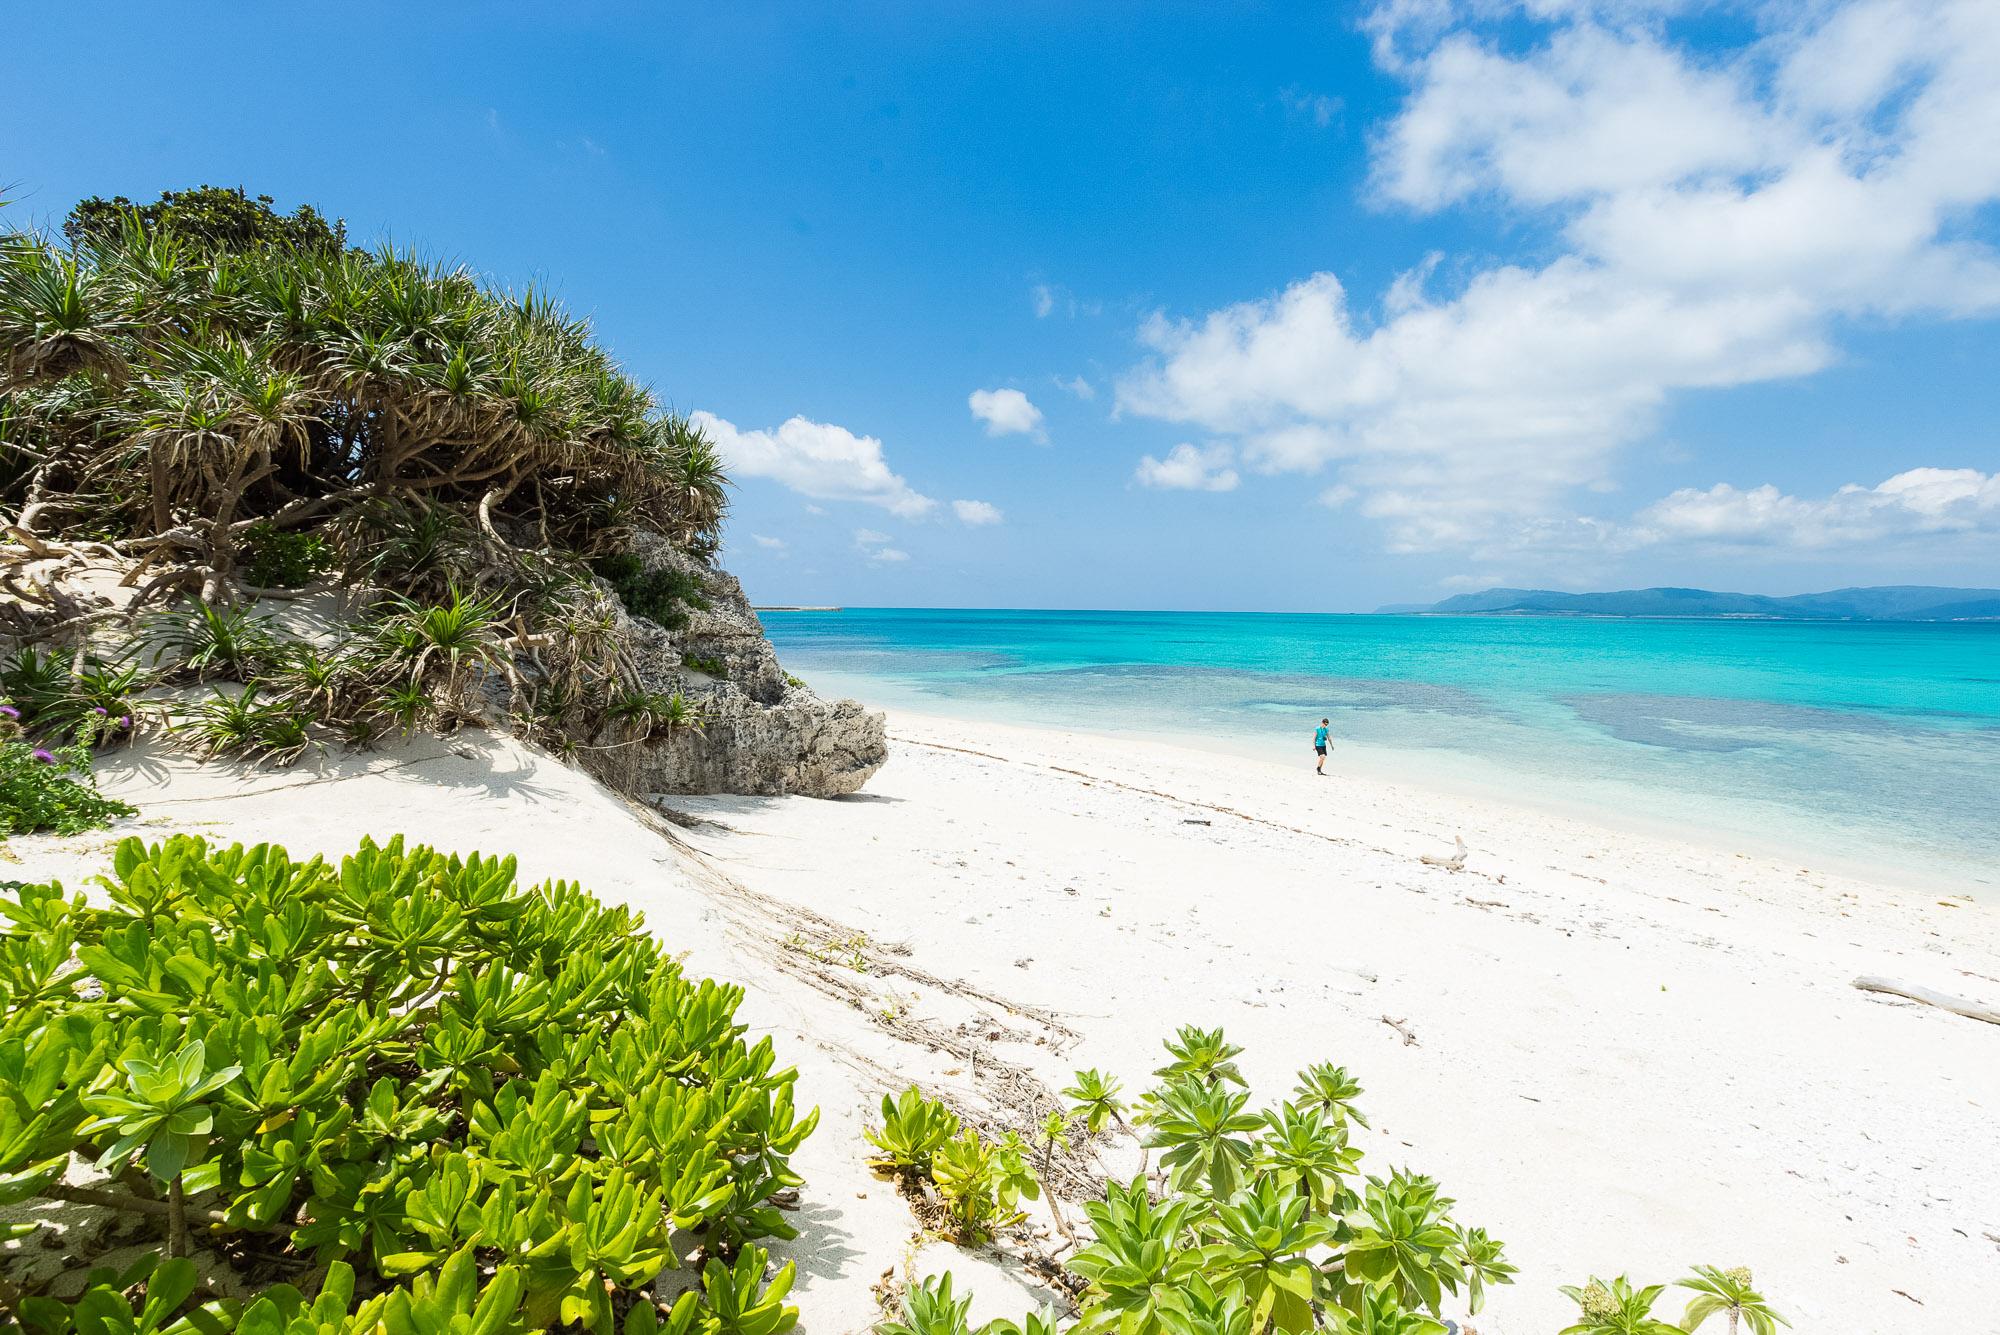 Aragusuku and Kuroshima Islands